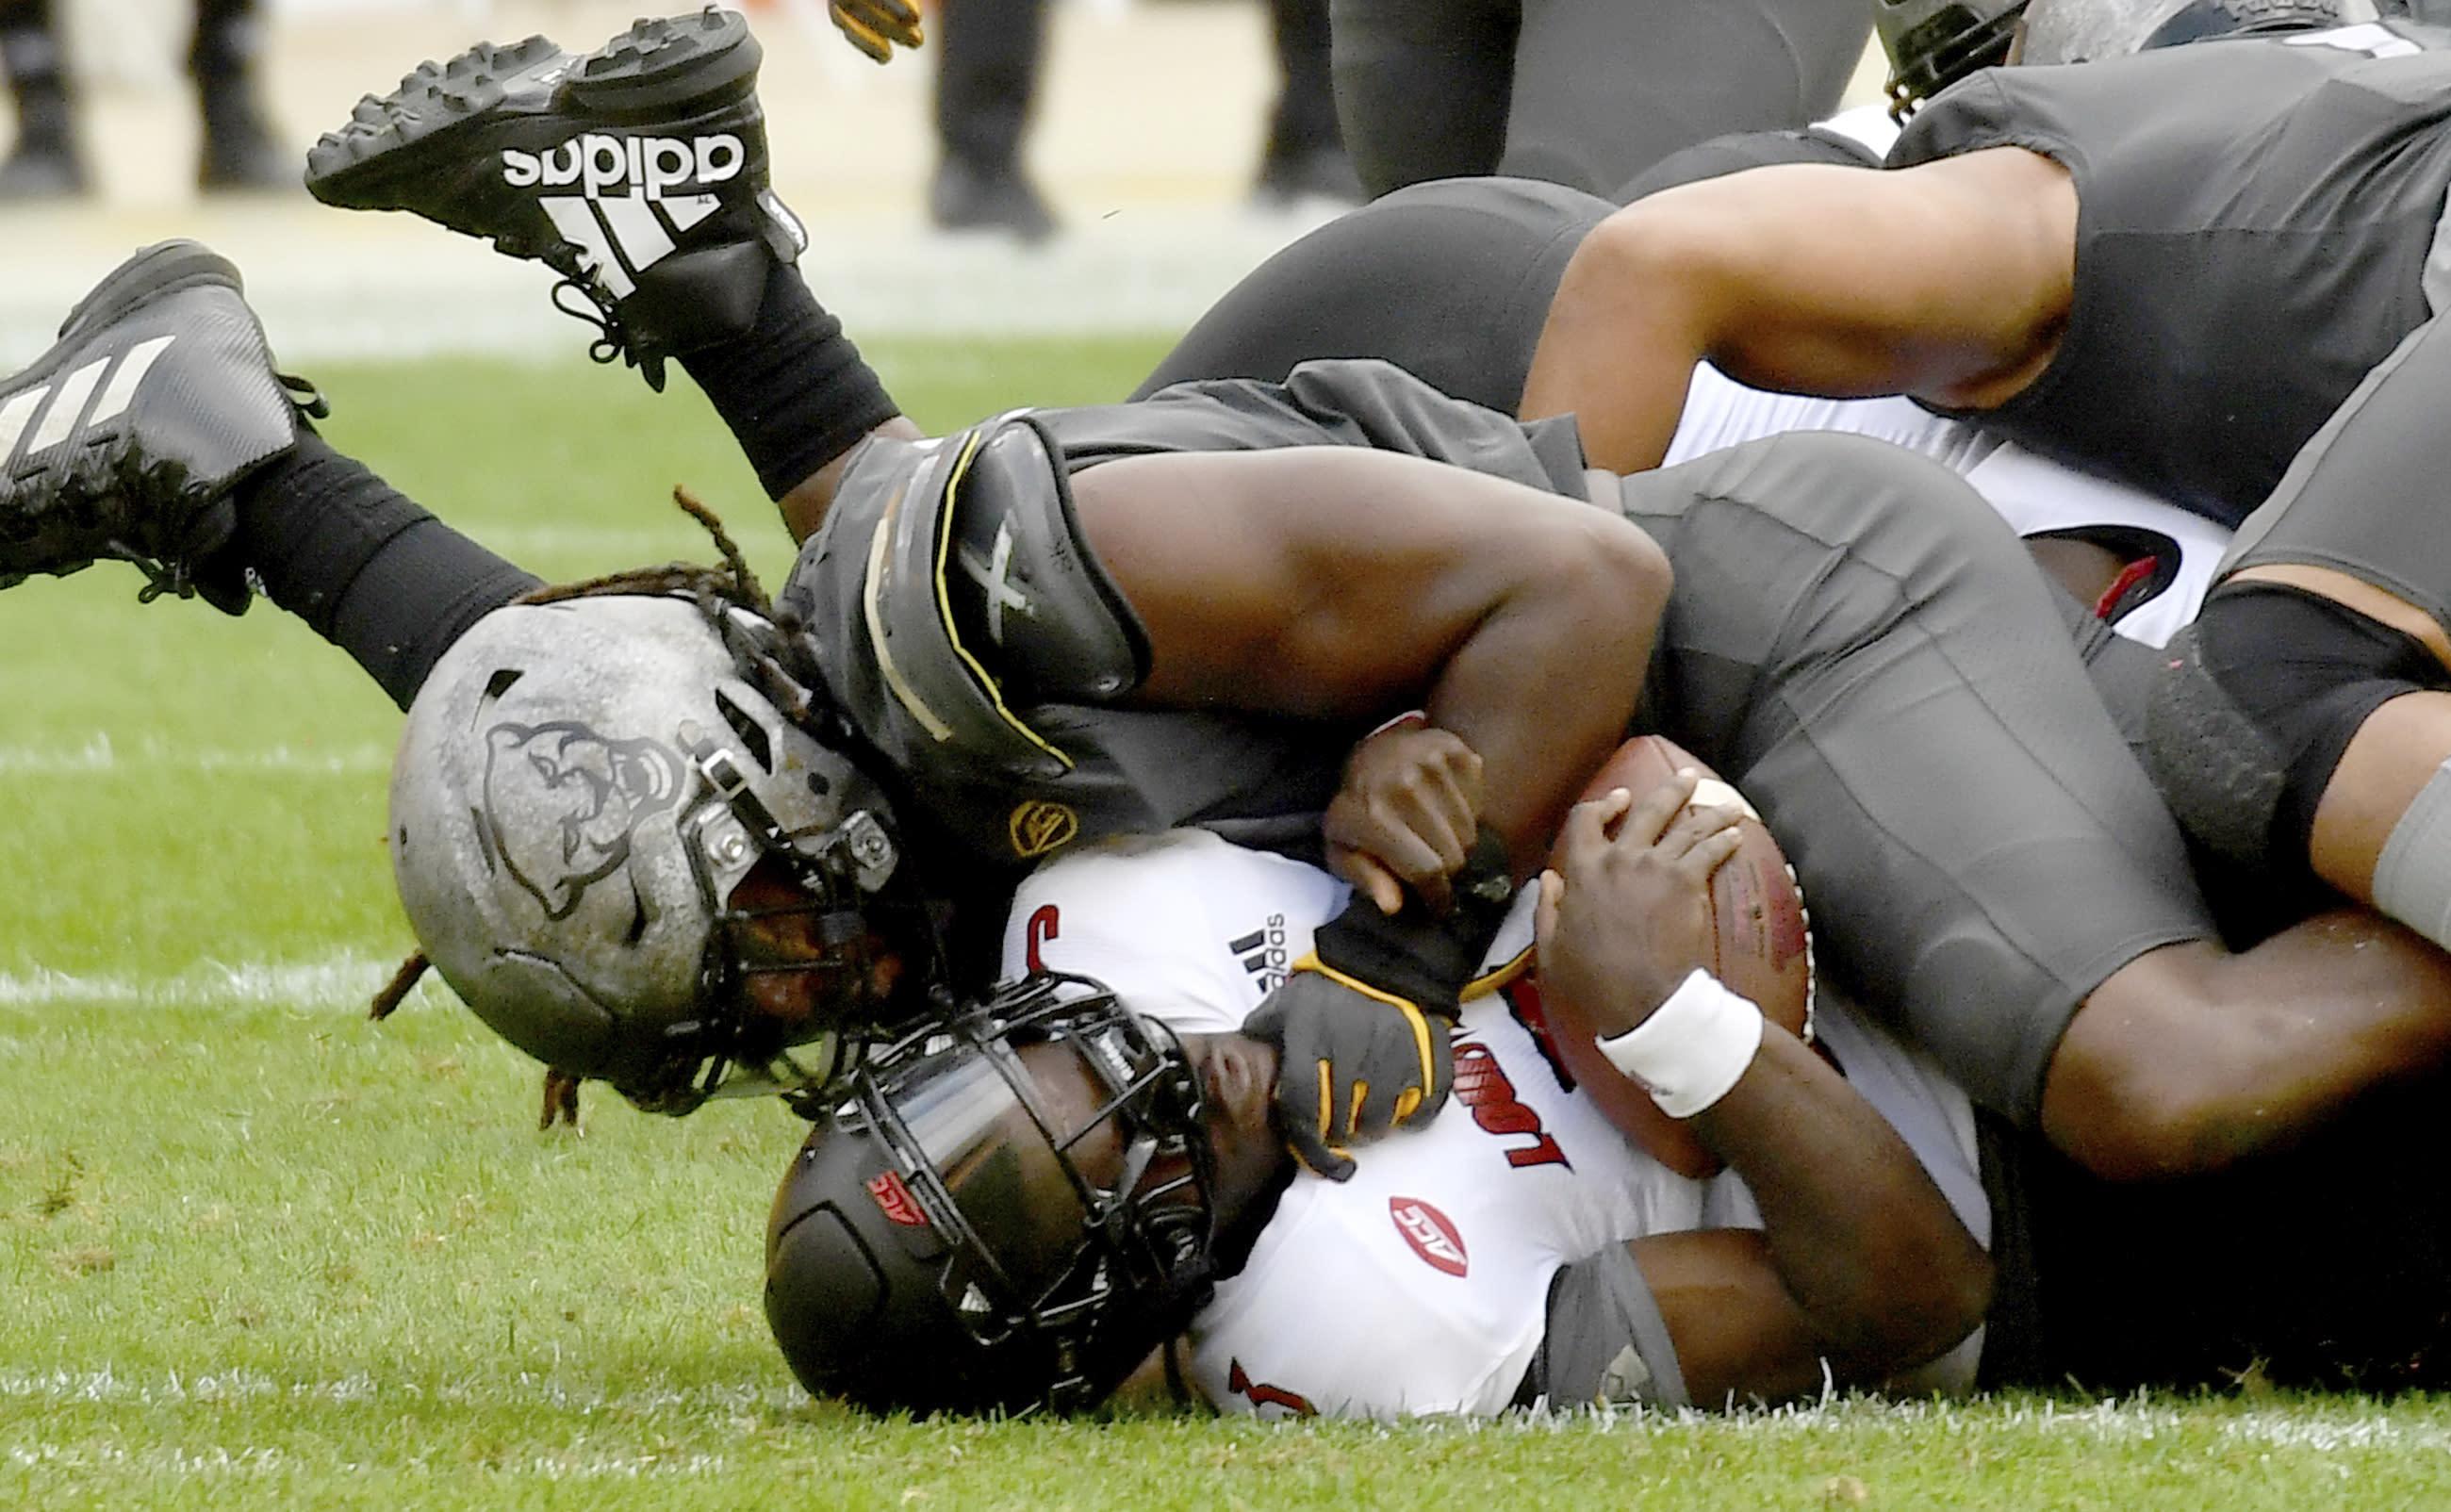 Pittsburgh defensive lineman Patrick Jones II sacks Louisville quarterback Malik Cunningham in the third quarter during an NCAA college football game at Heinz Field, Saturday, Sept. 26, 2020, in Pittsburgh. (Matt Freed/Pittsburgh Post-Gazette via AP)